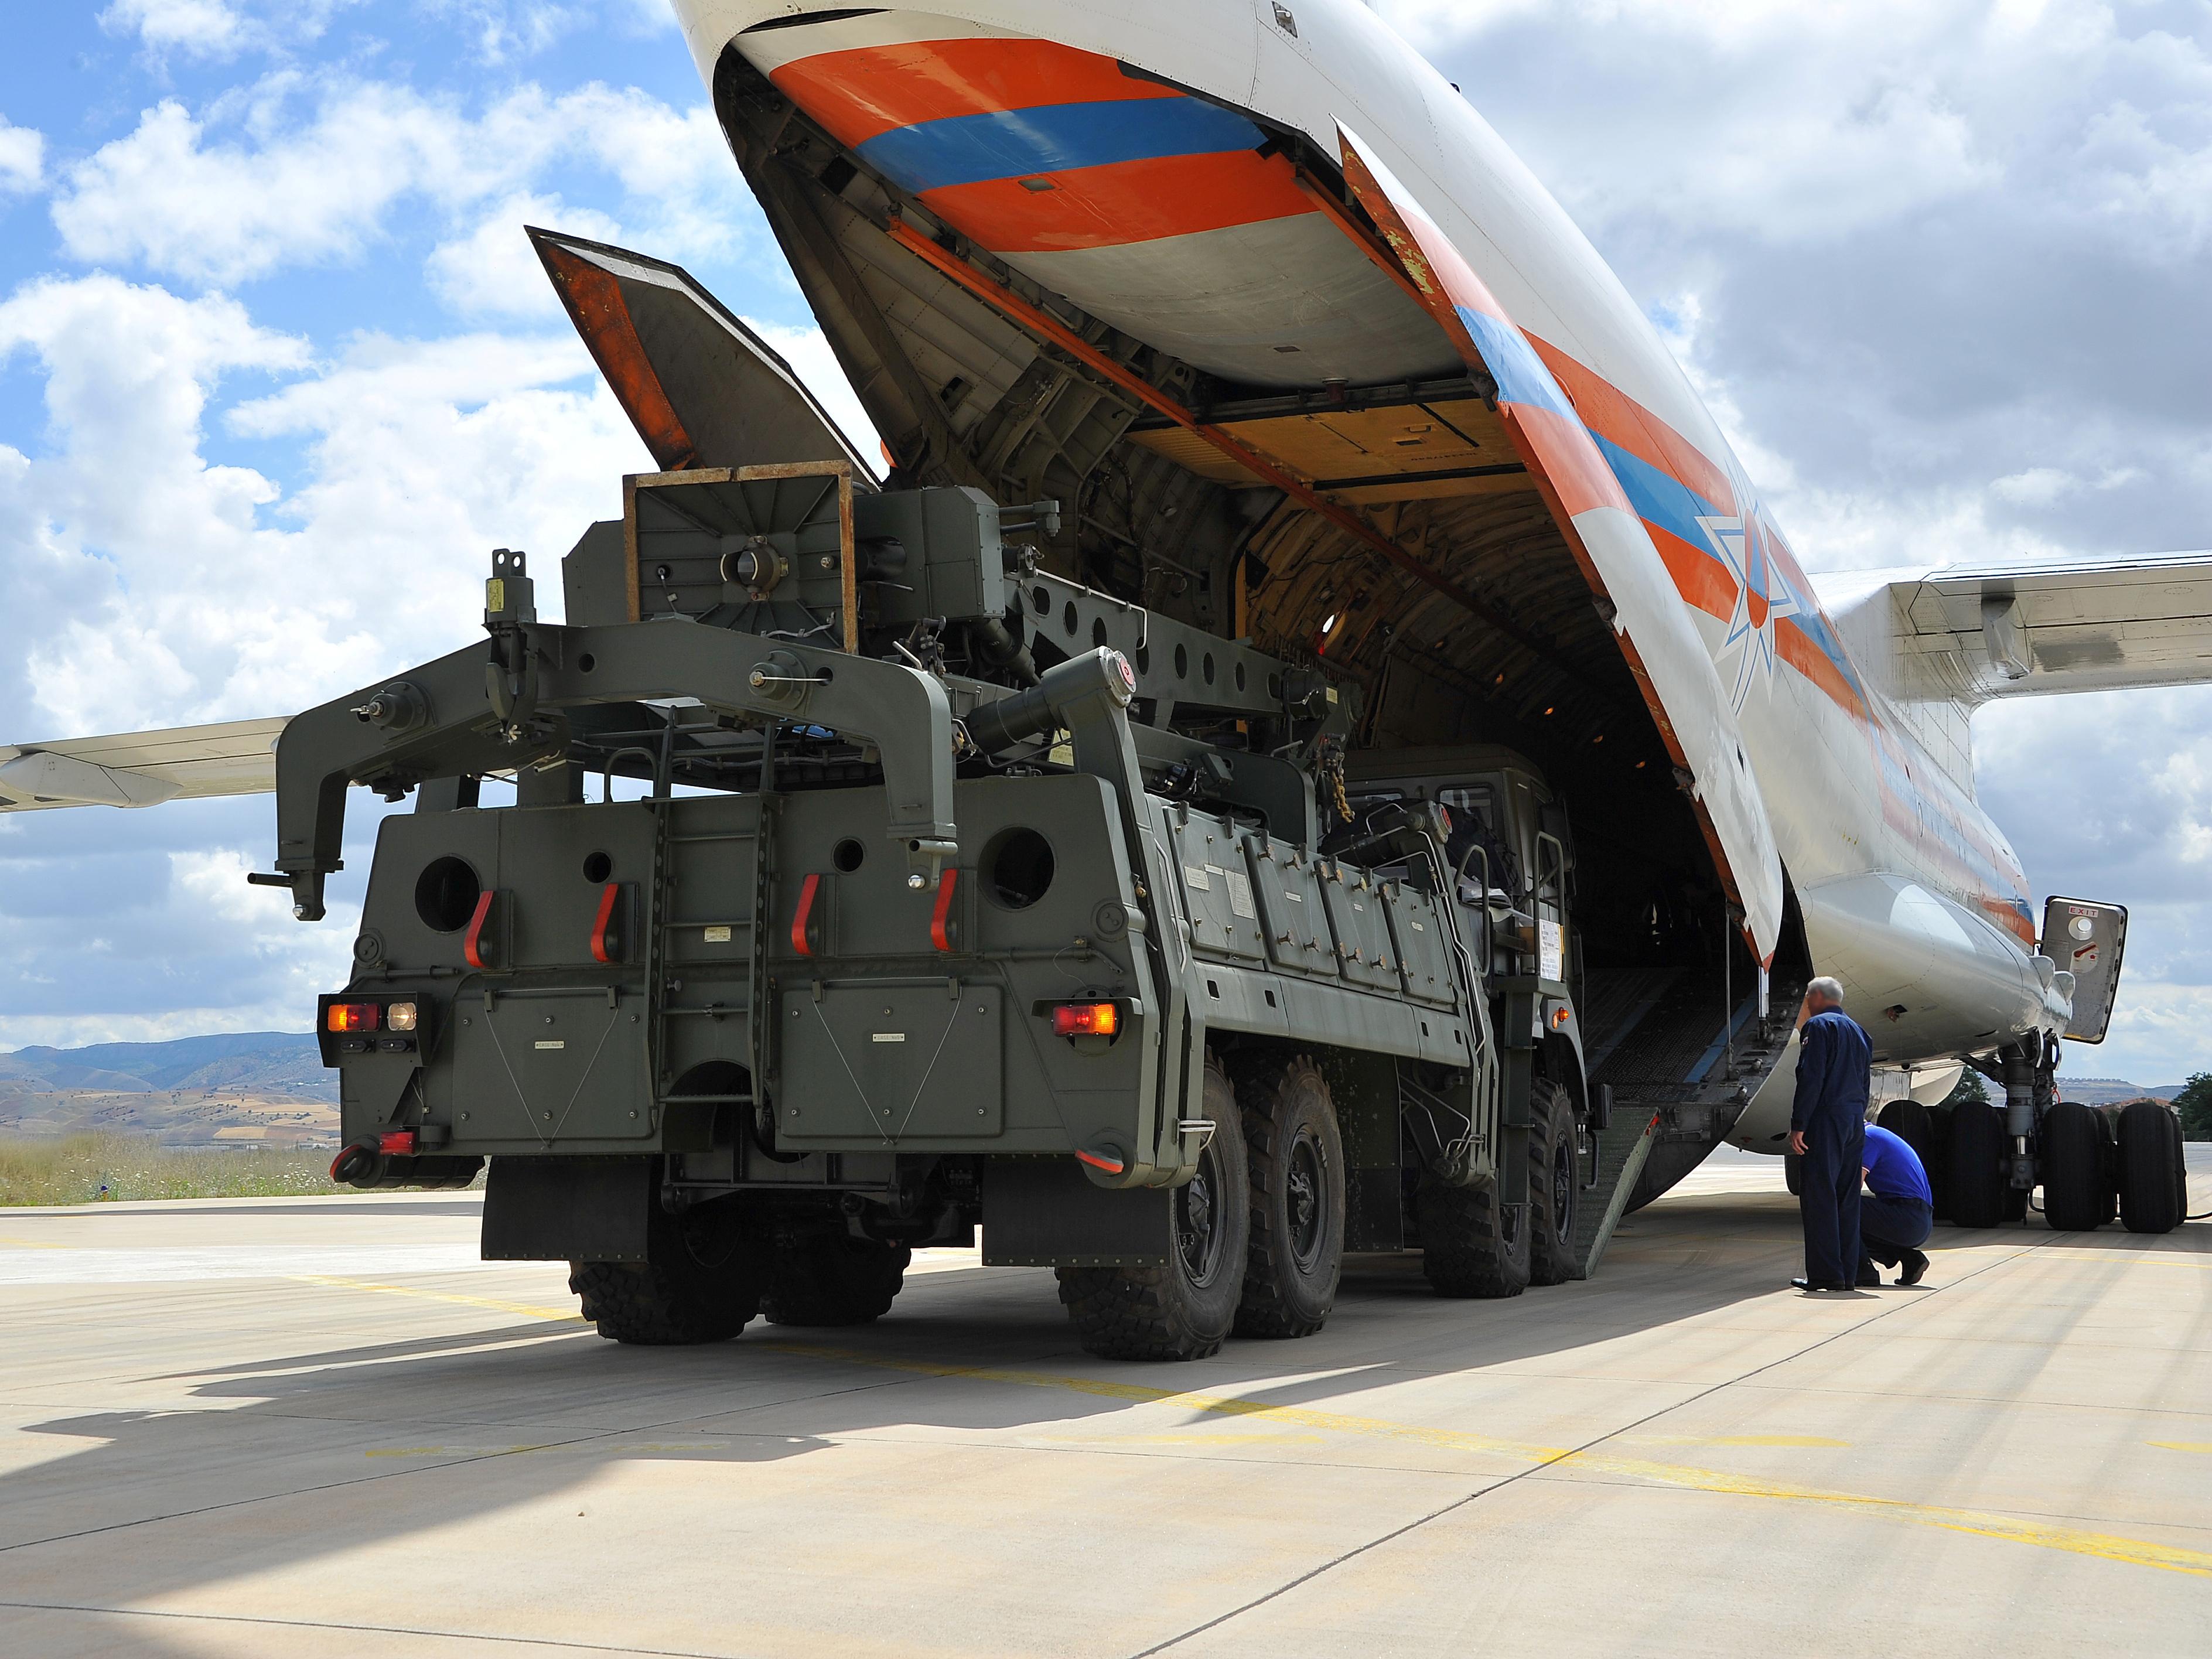 After Russian air defense deal, can Ankara and Washington repair their relationship?